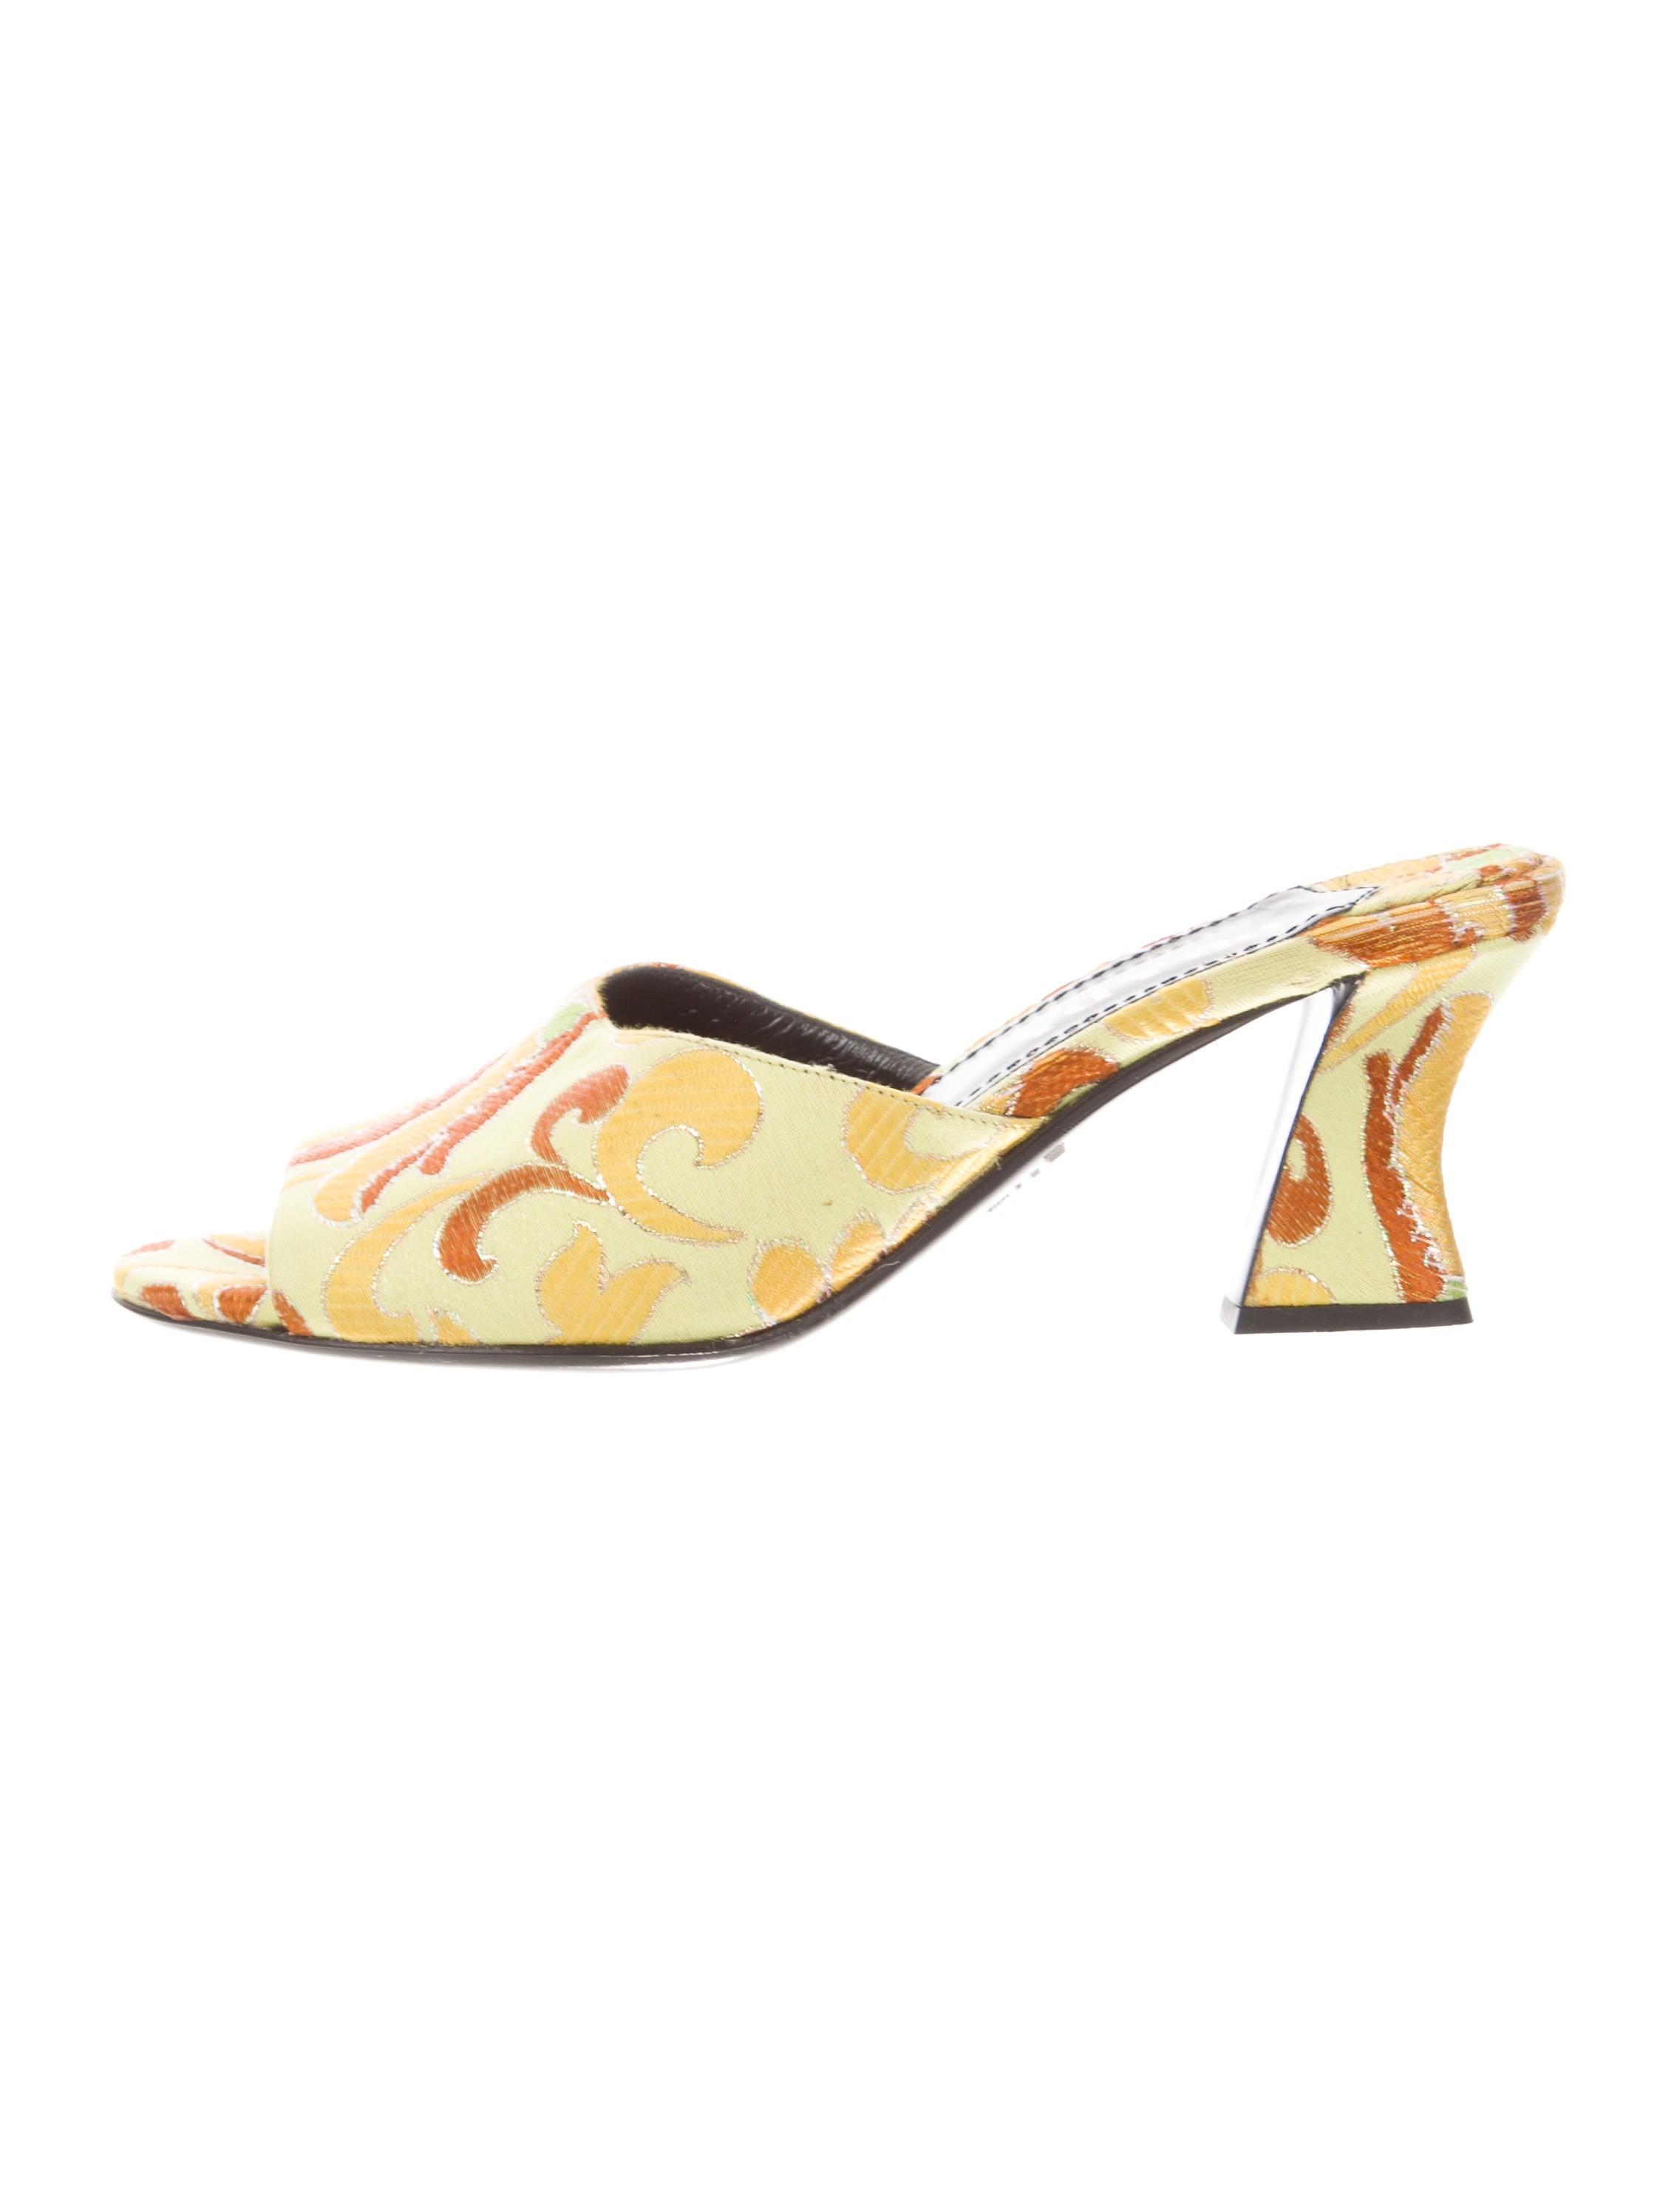 ac4b90ef199 Prada Embroidered Mid-Heel Sandals - Shoes - PRA232983